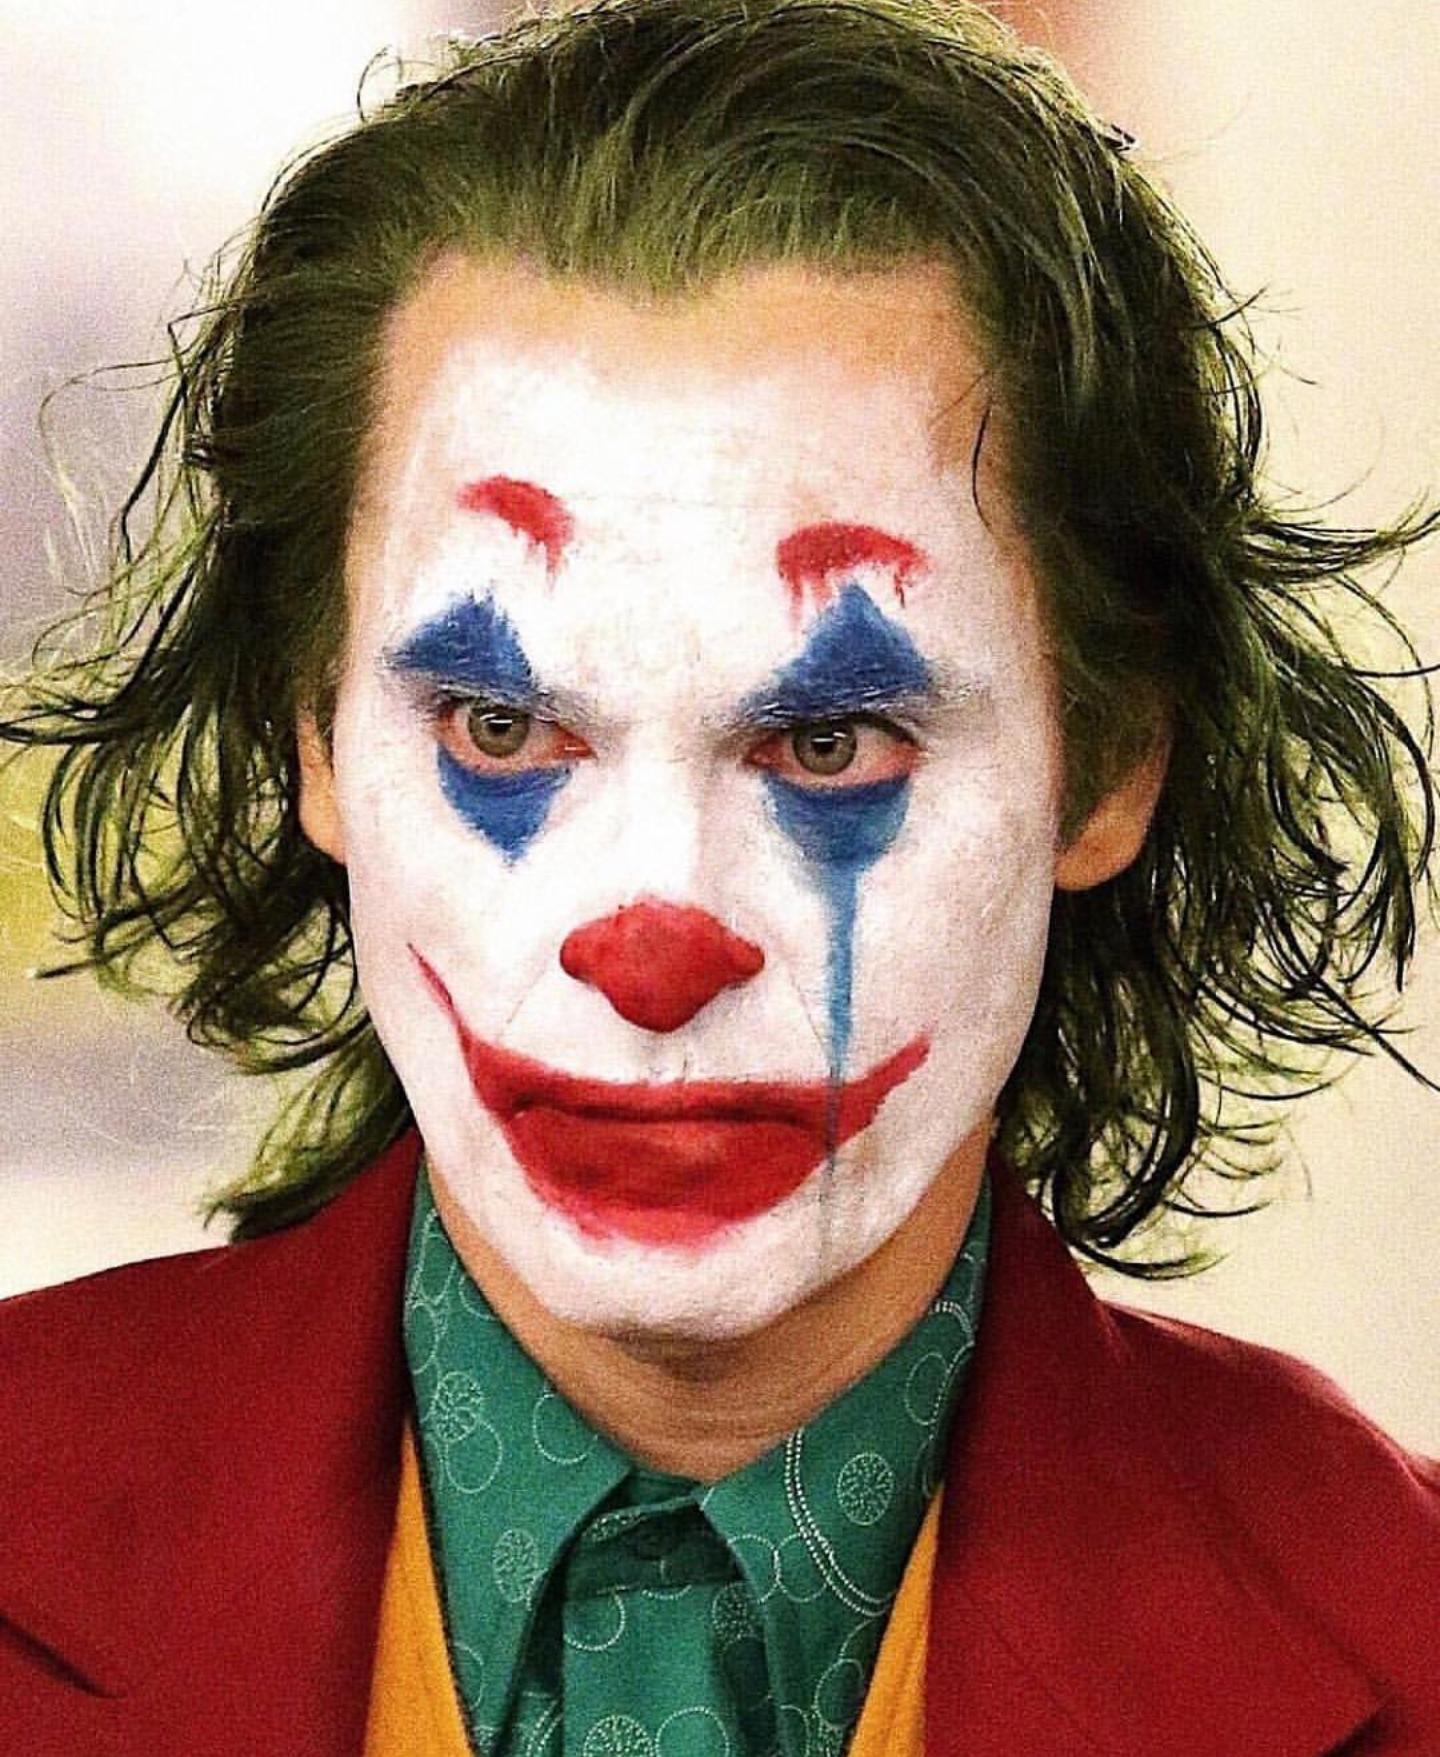 Joaquin Phoenix Joker Joaquinphoenixjoker Filming The